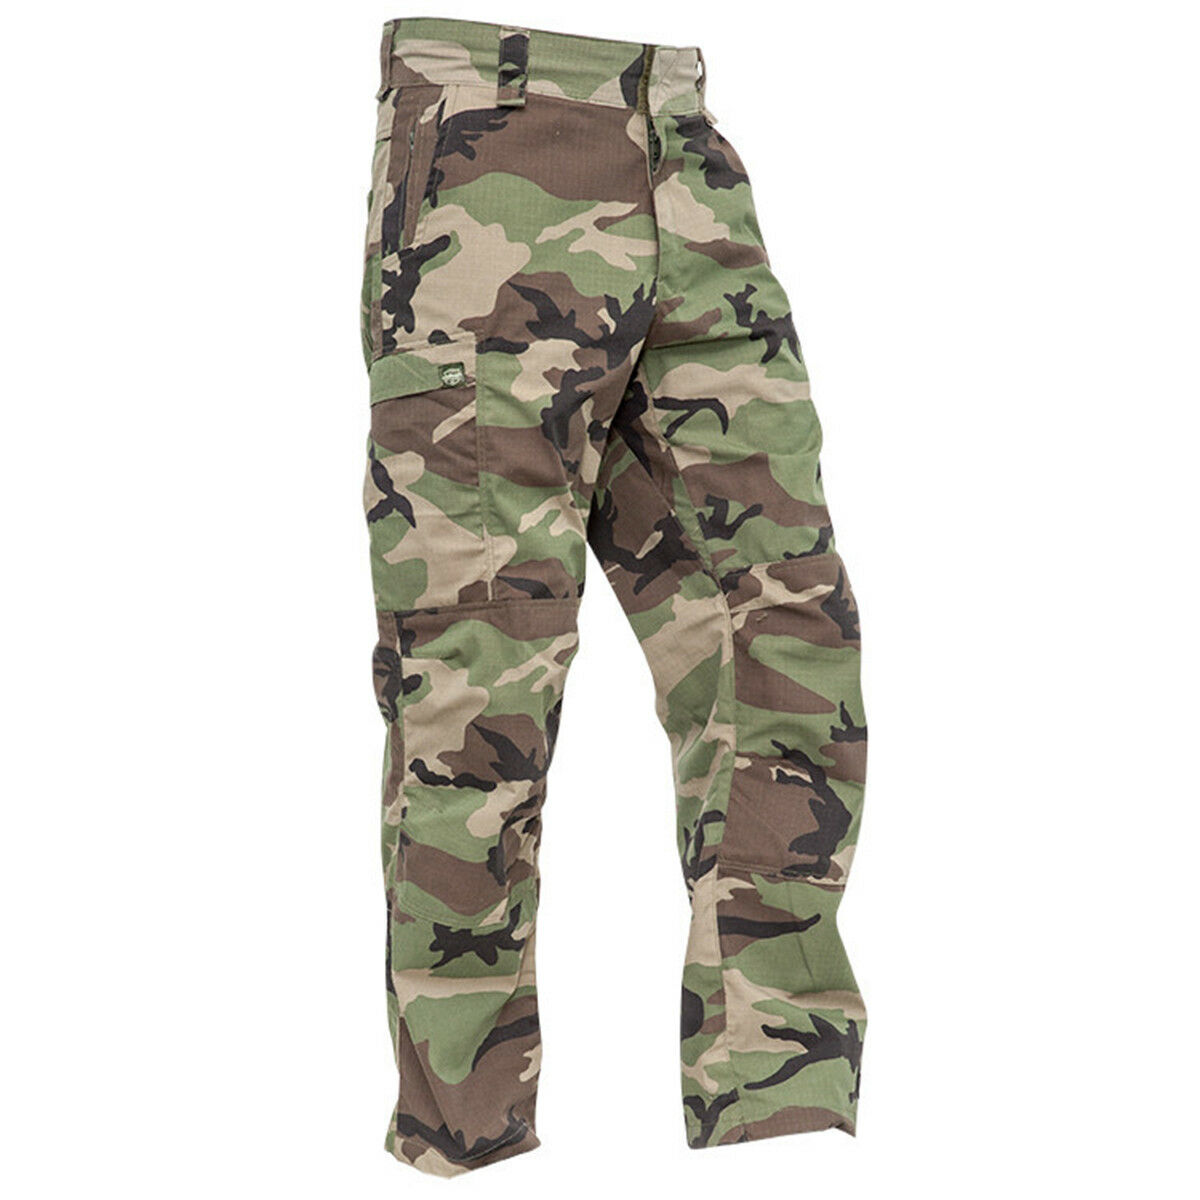 Valken - Kilo Combat Pants - Woodland - Valken 2X 477a24